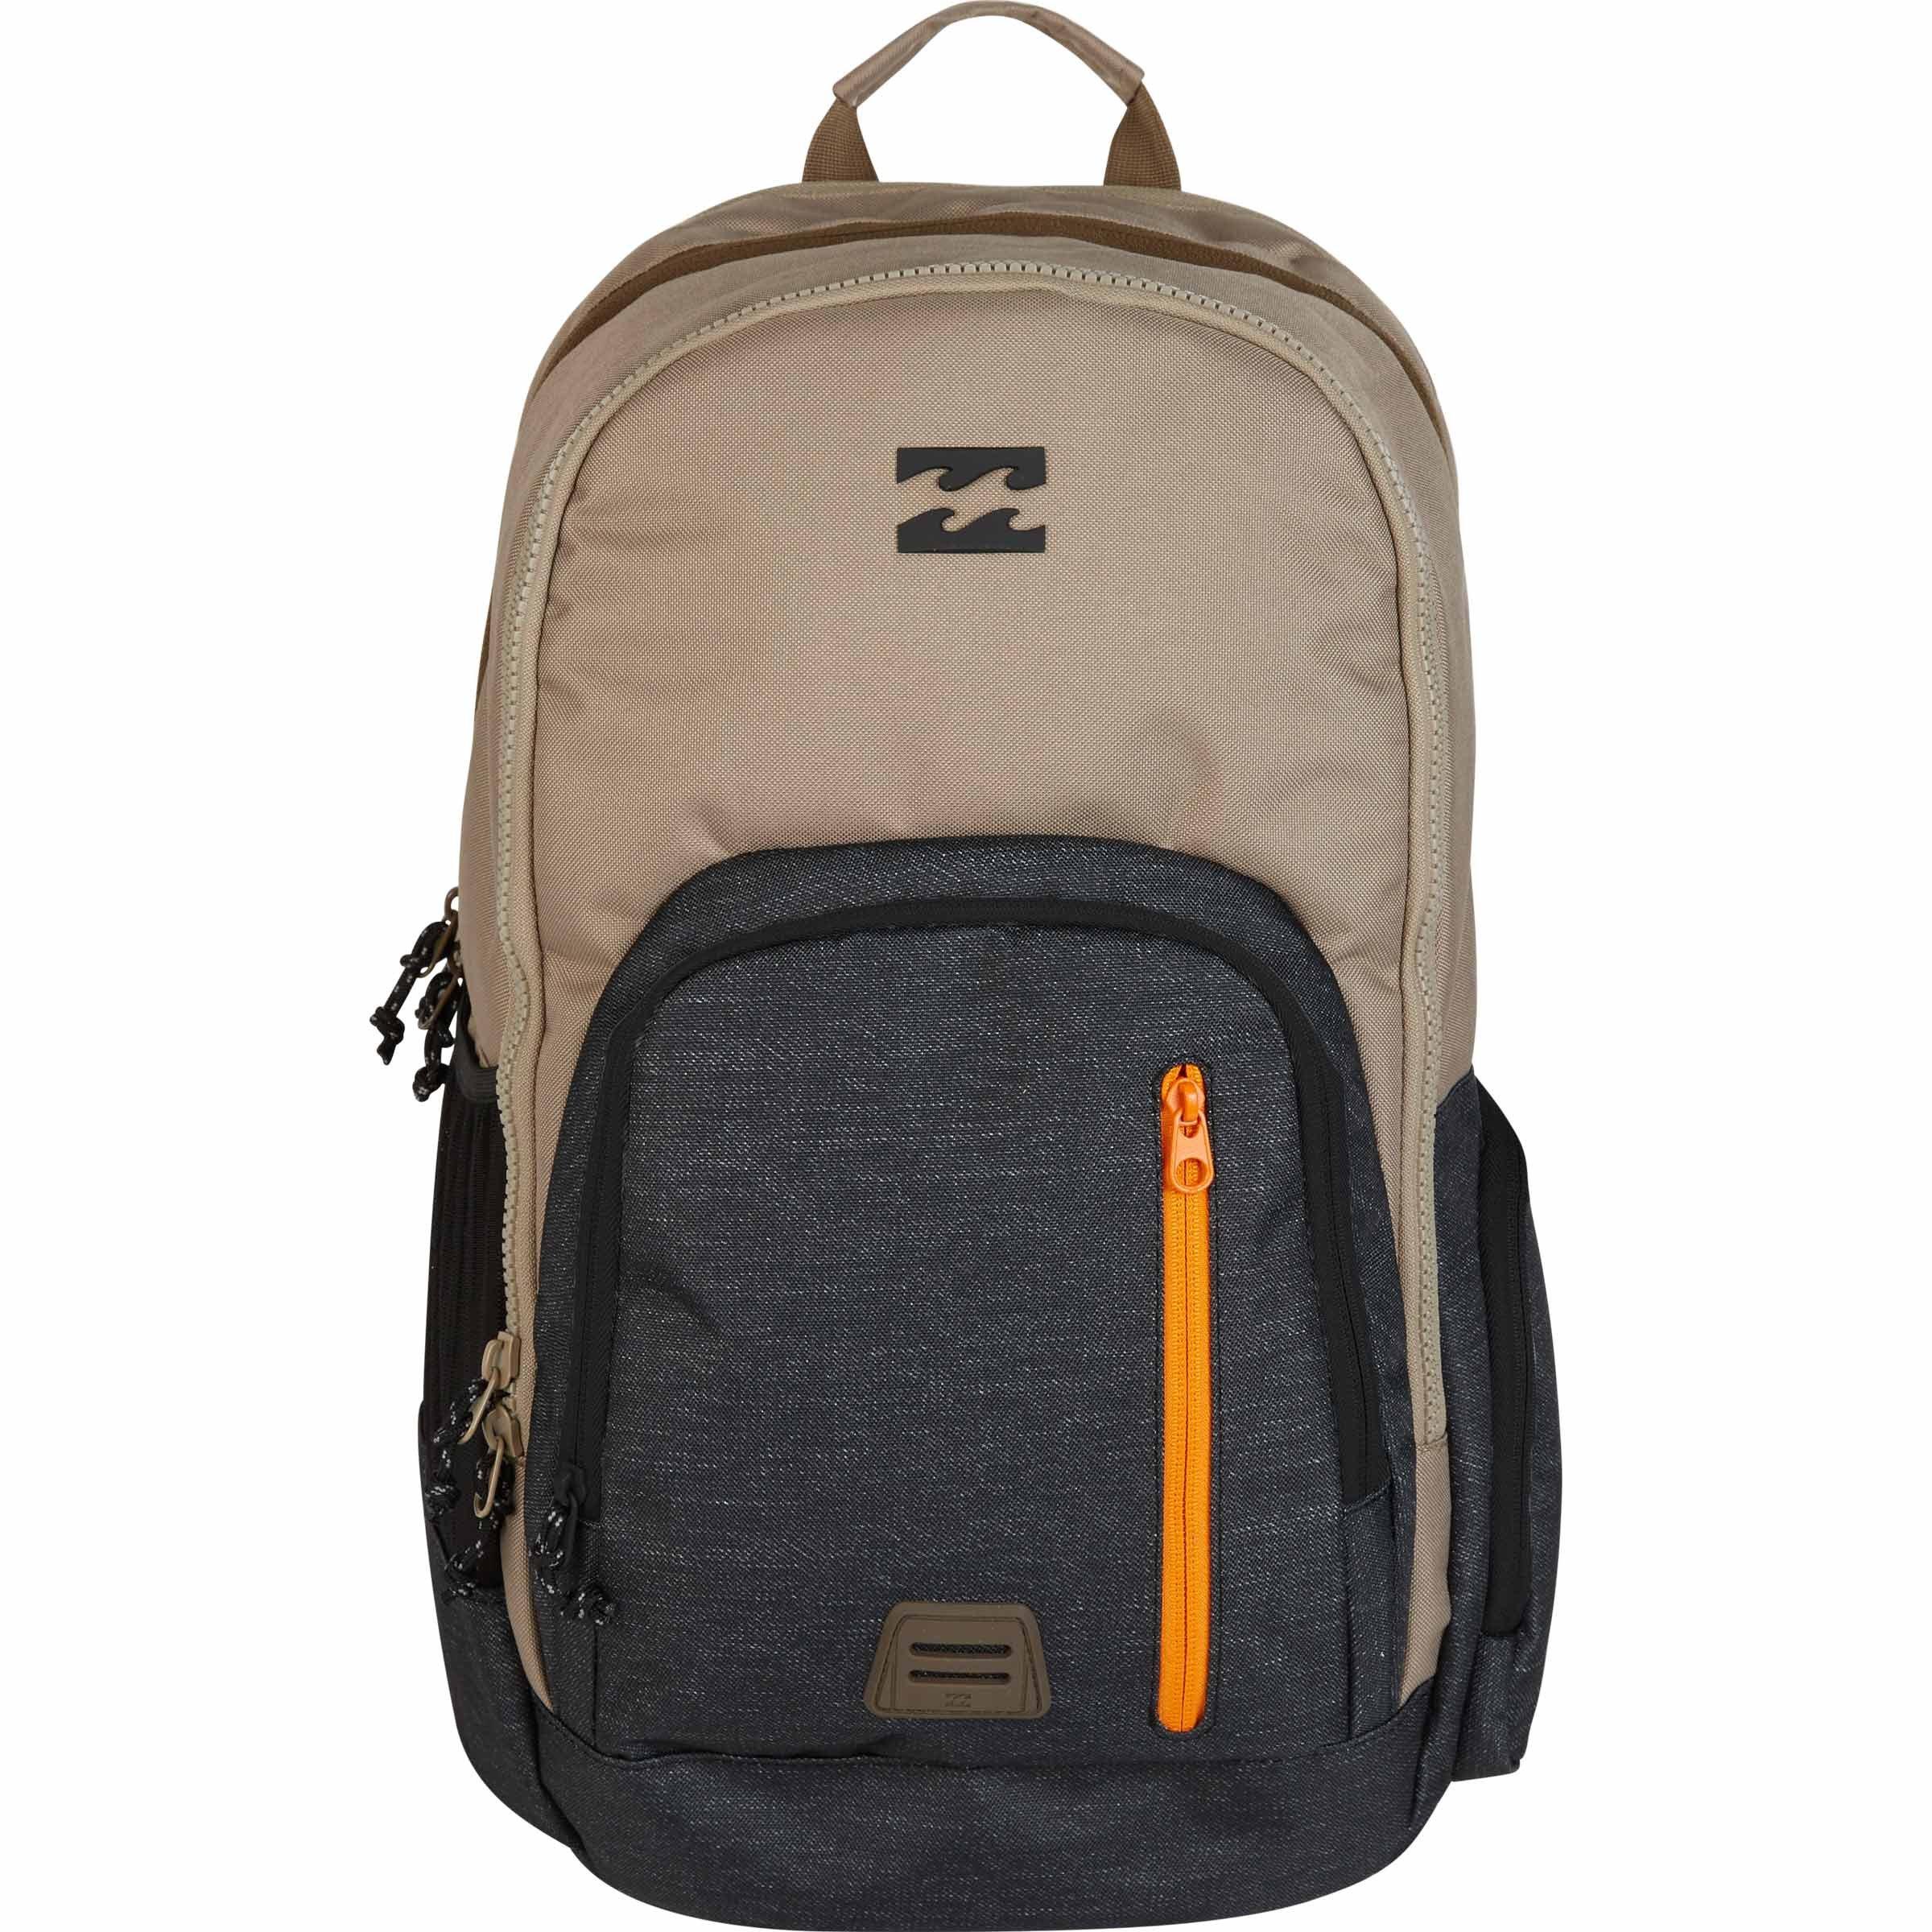 Billabong Unisex Command Pack, khaki, One Size